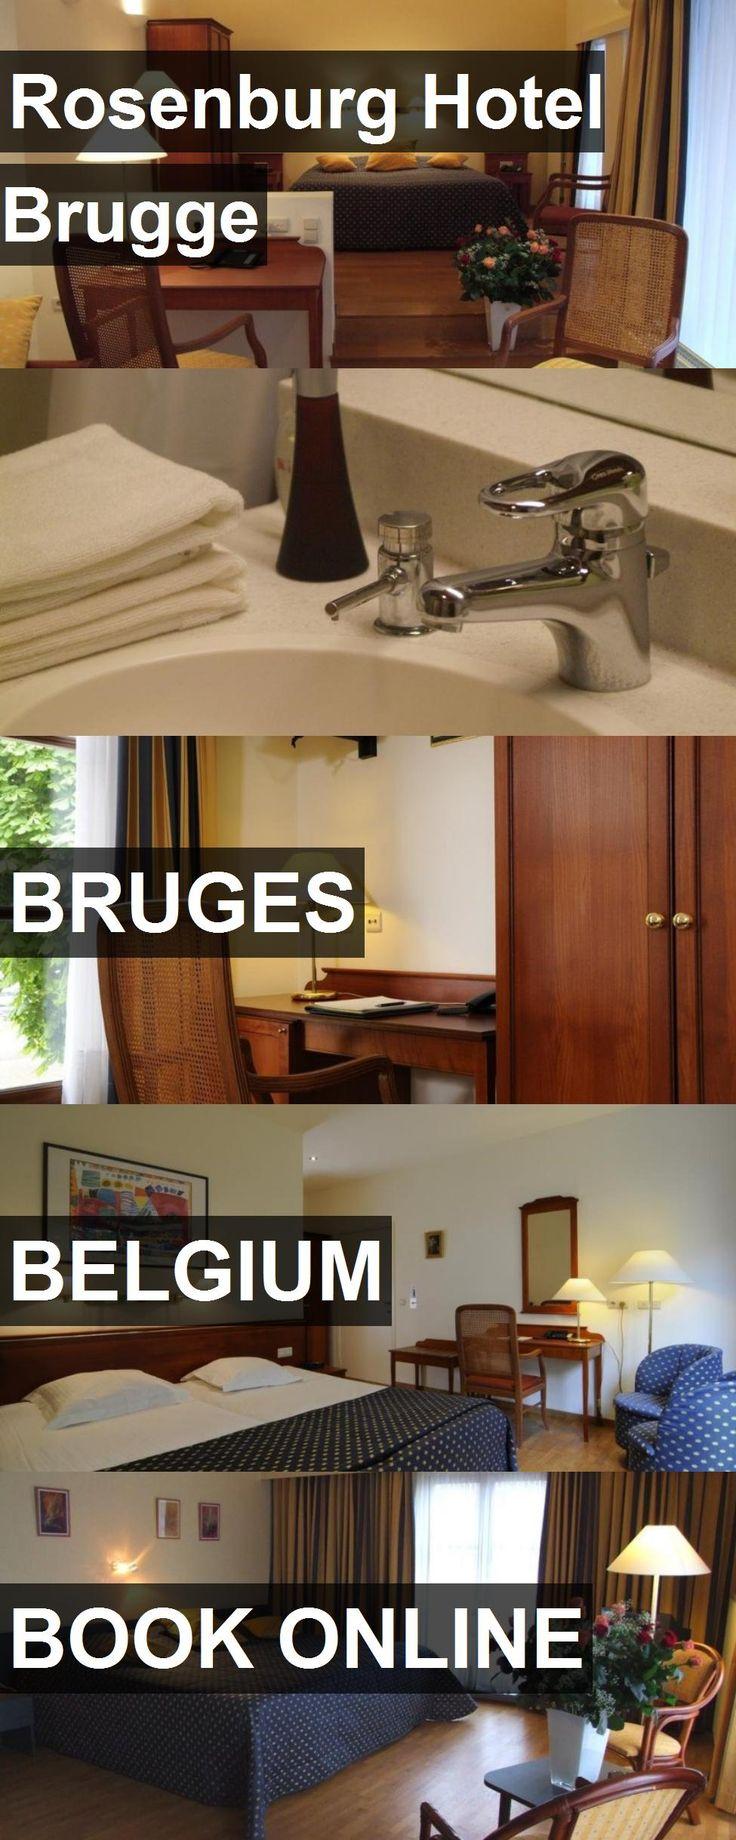 Hotel Rosenburg Hotel Brugge in Bruges, Belgium. For more information, photos, reviews and best prices please follow the link. #Belgium #Bruges #RosenburgHotelBrugge #hotel #travel #vacation